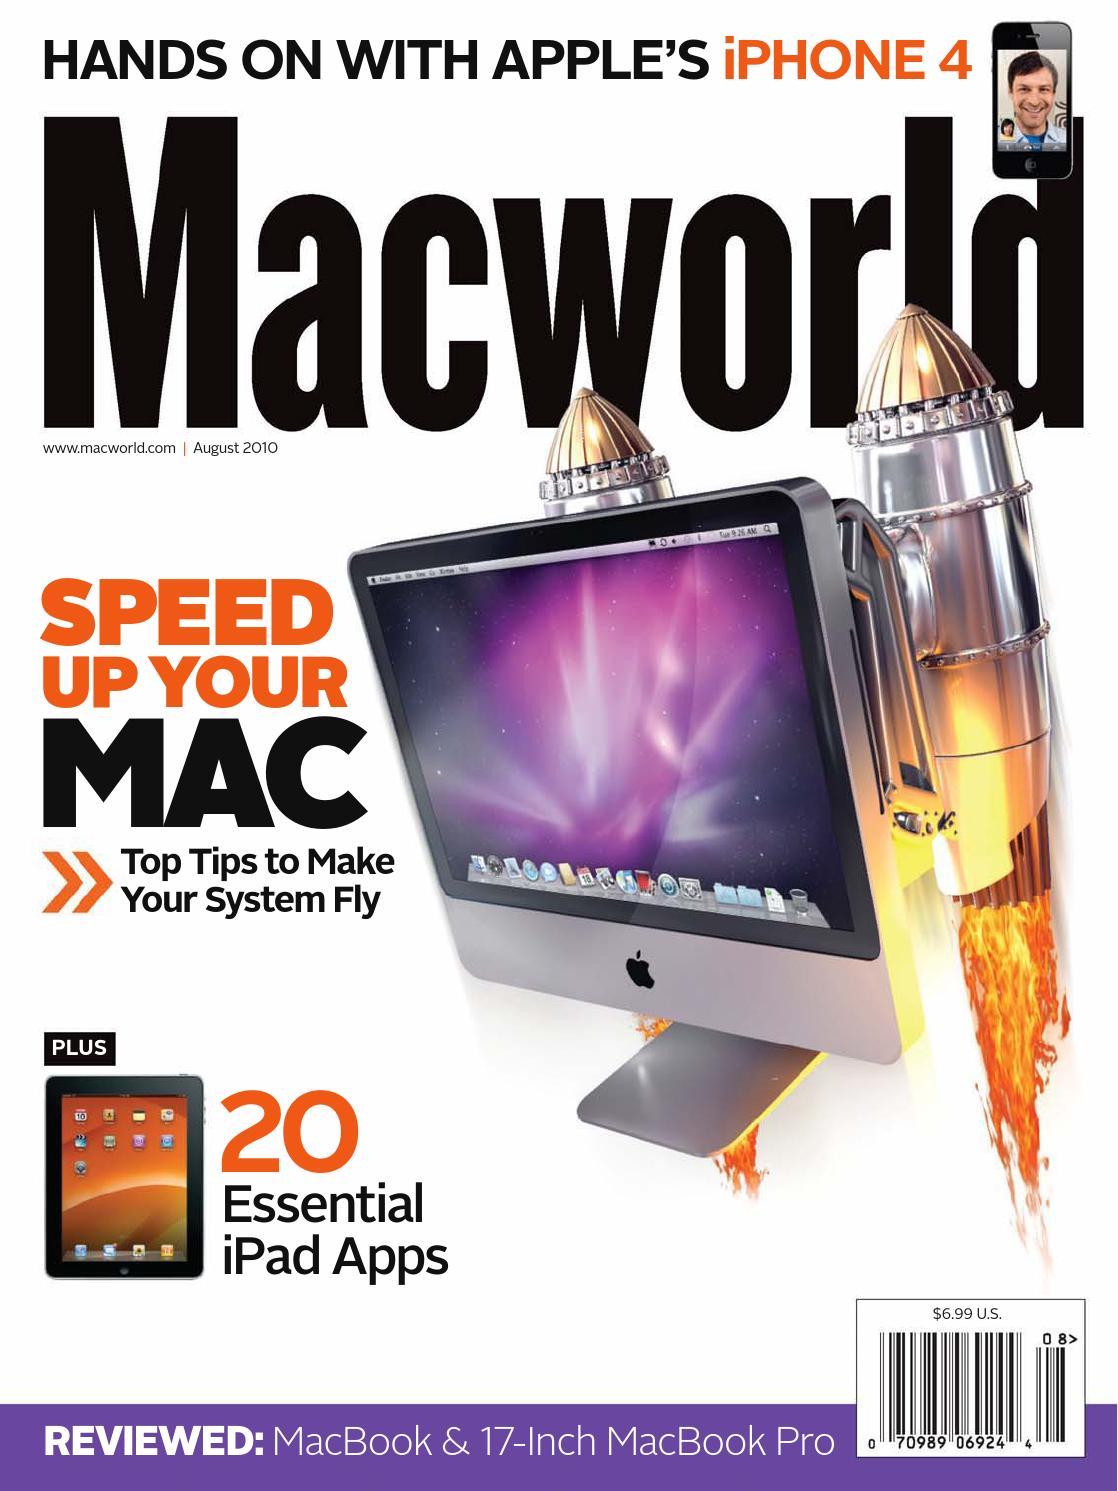 .com Templates 5195 | Macworld 2010 08 By Backuper Issuu